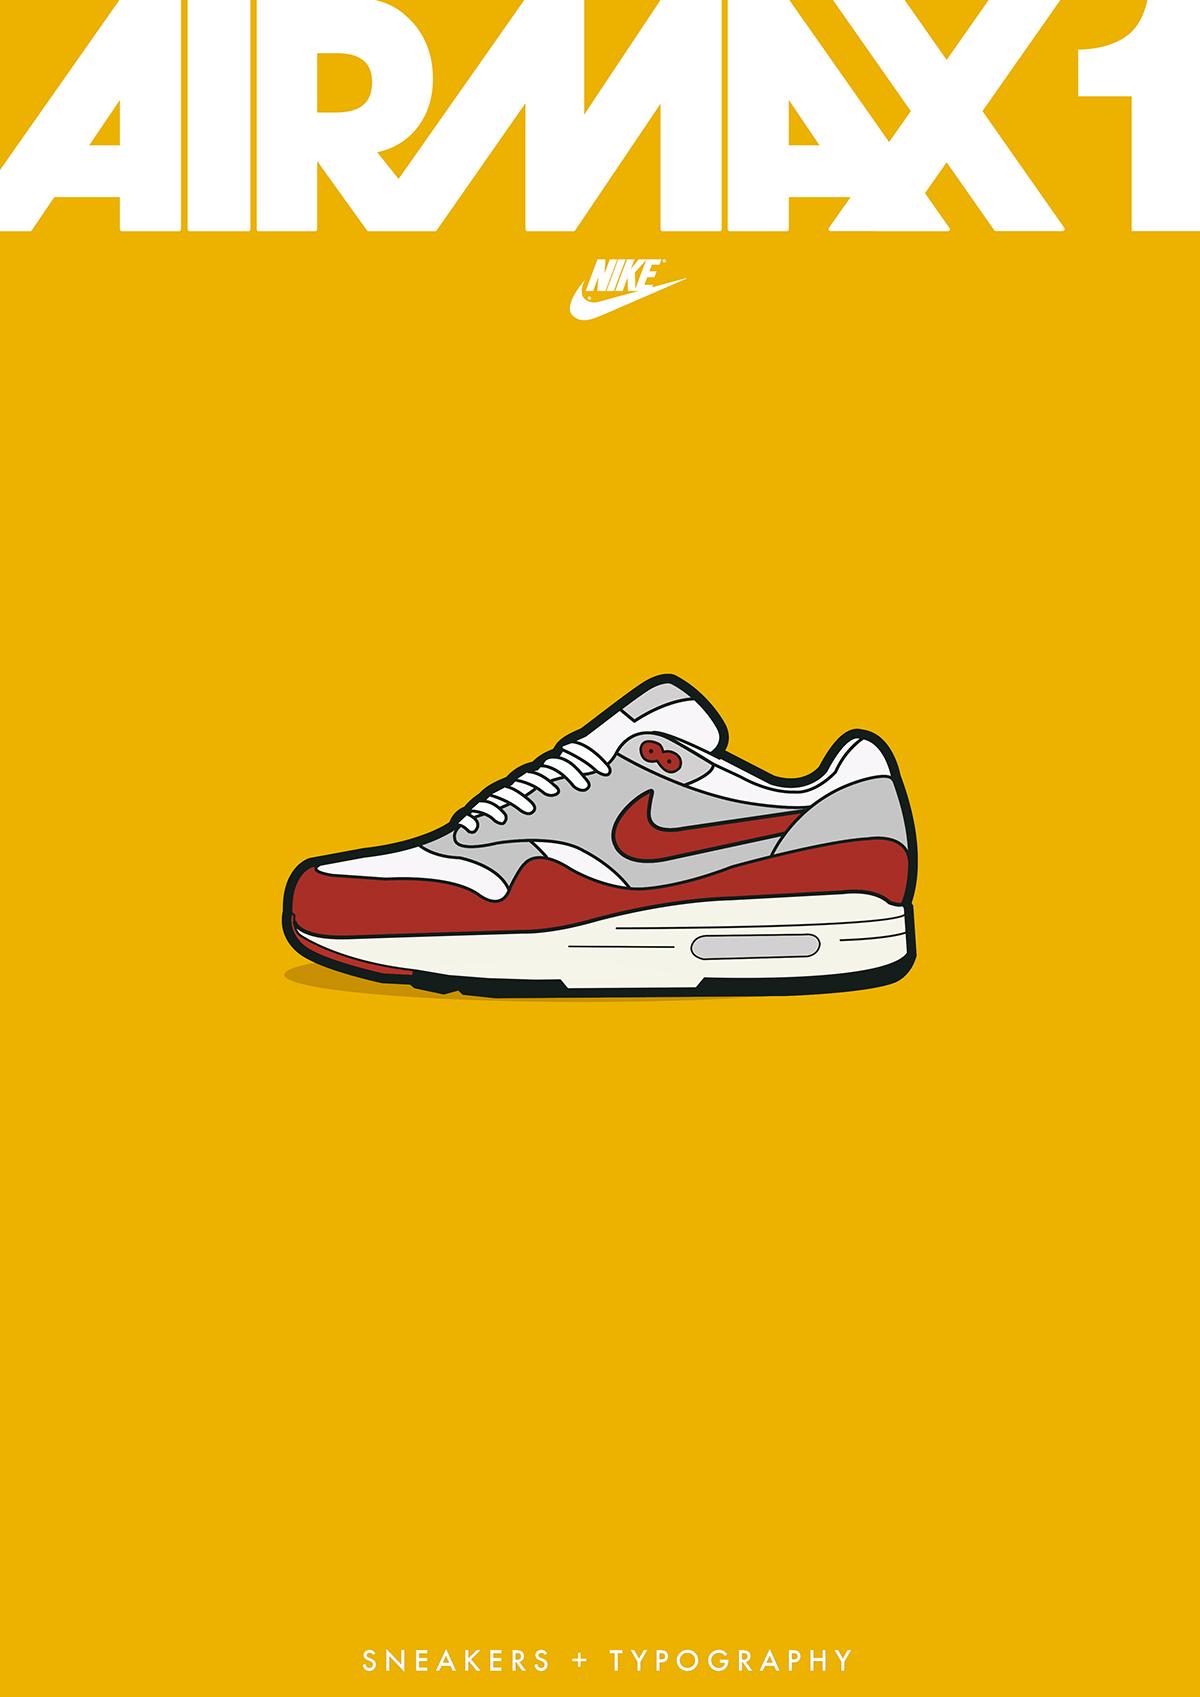 Talisman & Co. | Nike Air Max 1 | Pablo Cánepa